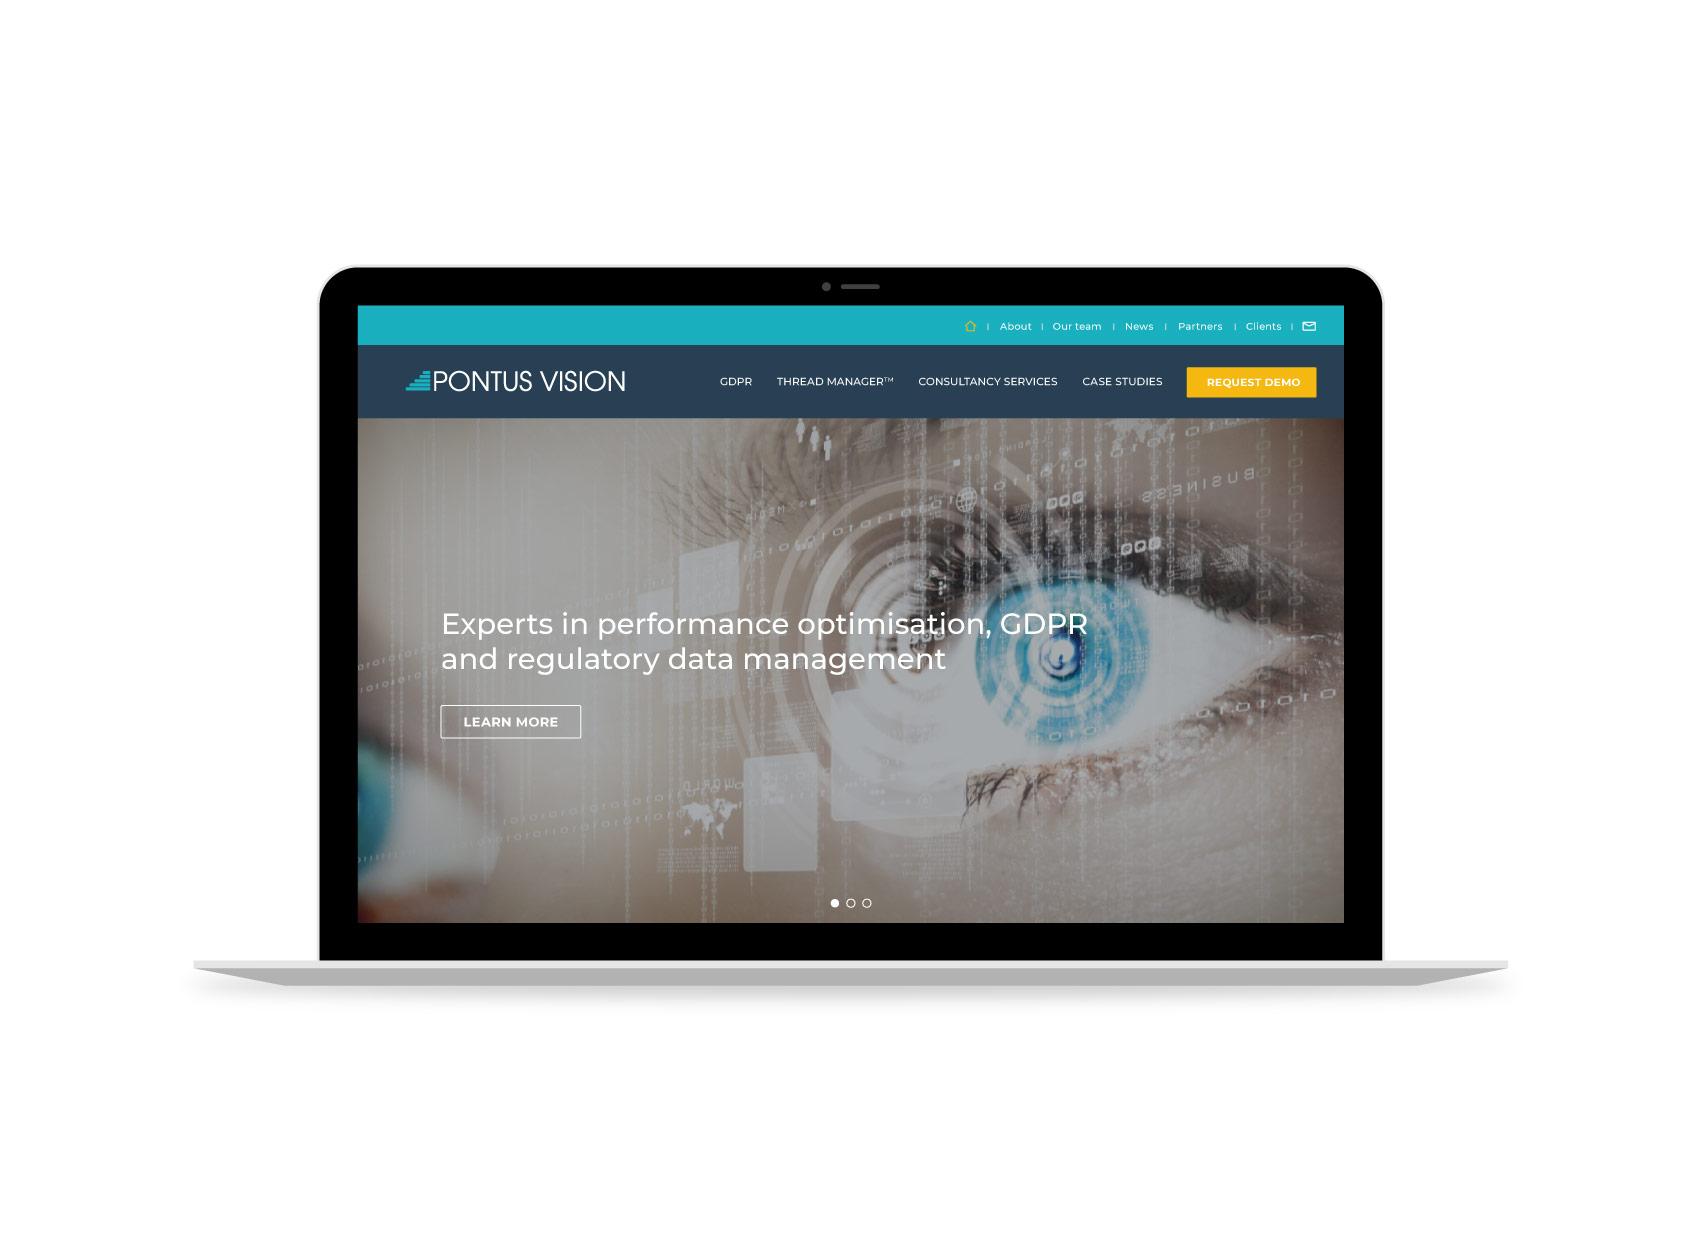 pontus vision website